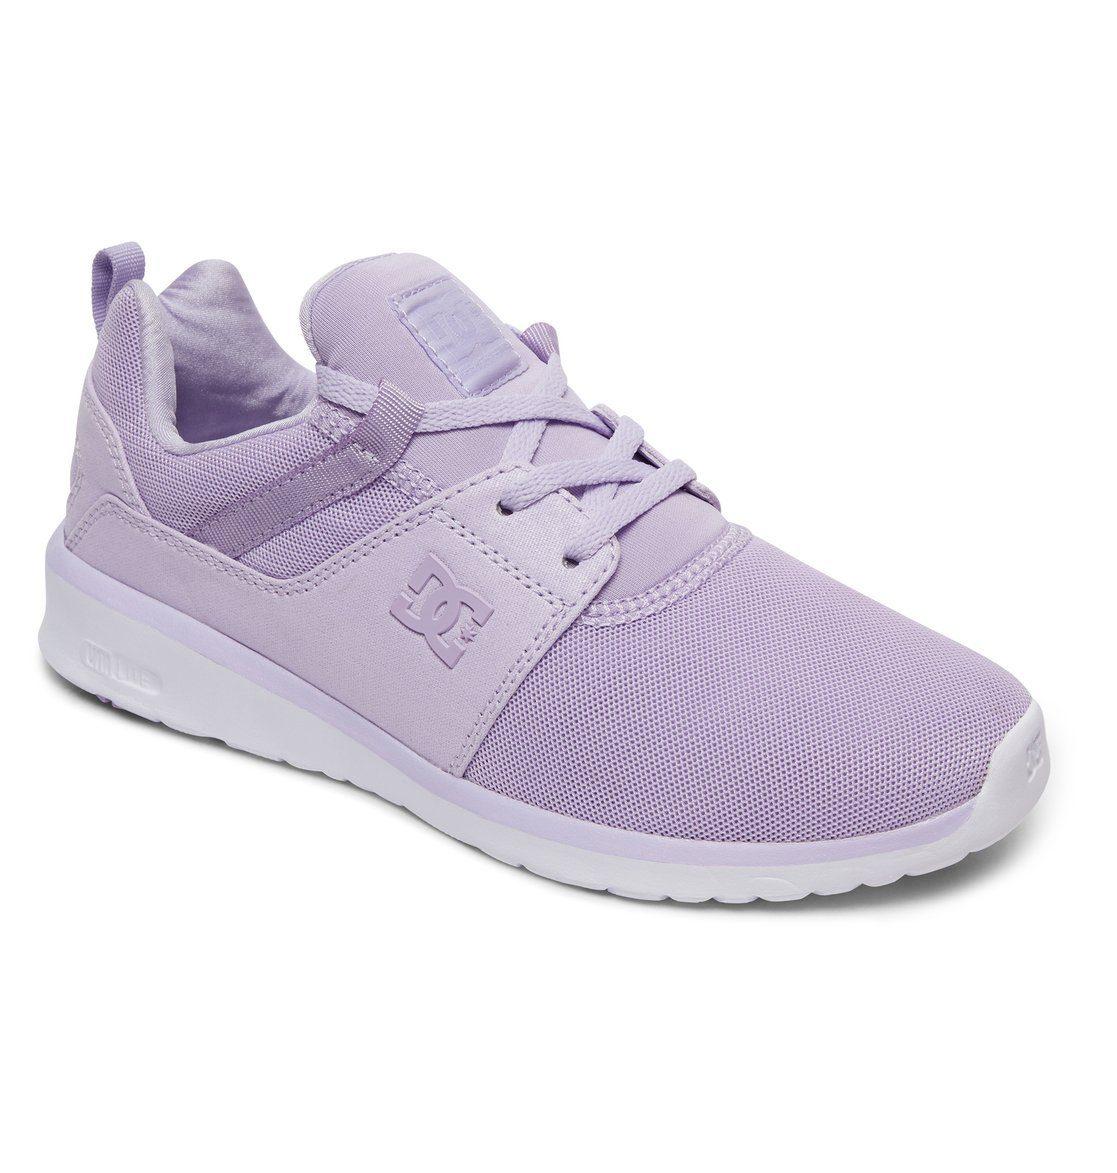 DC Shoes Schuhe Heathrow online kaufen  Lilac